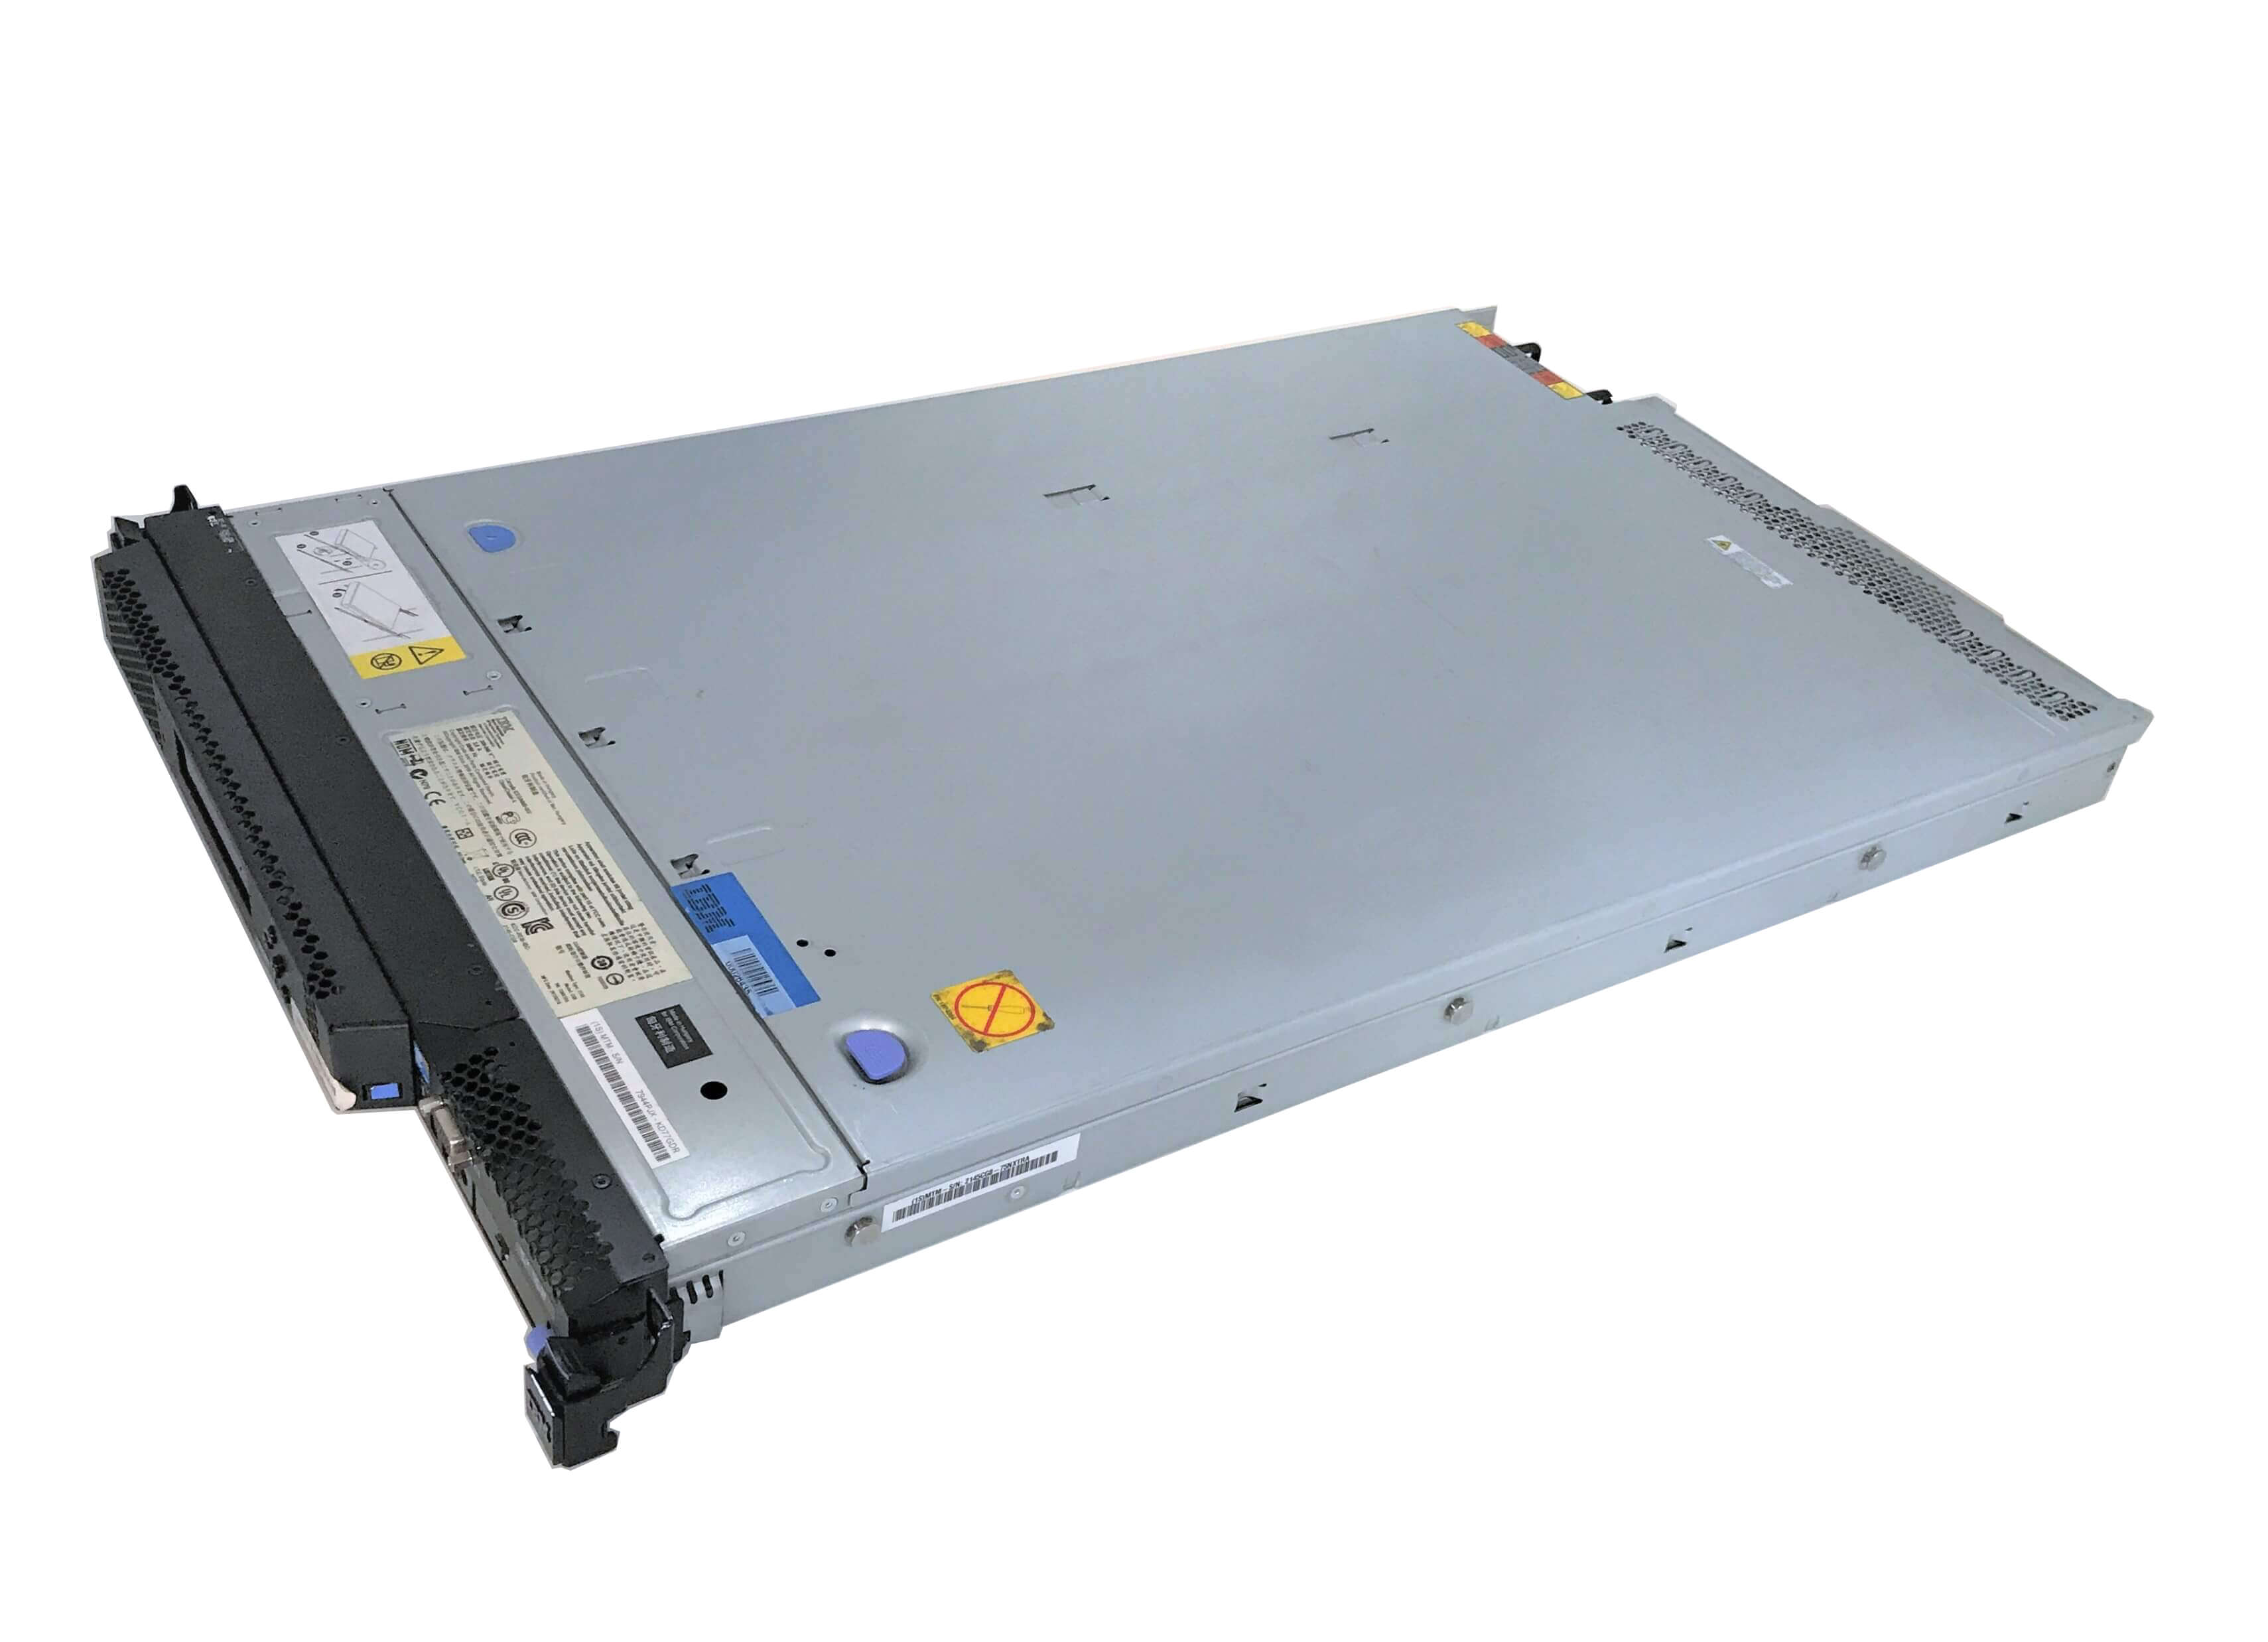 IBM 2145-CG8 XEON HEXACORE E5645 2.4 / 64 GB DDR3 ECC / 6X 136GB 2.5